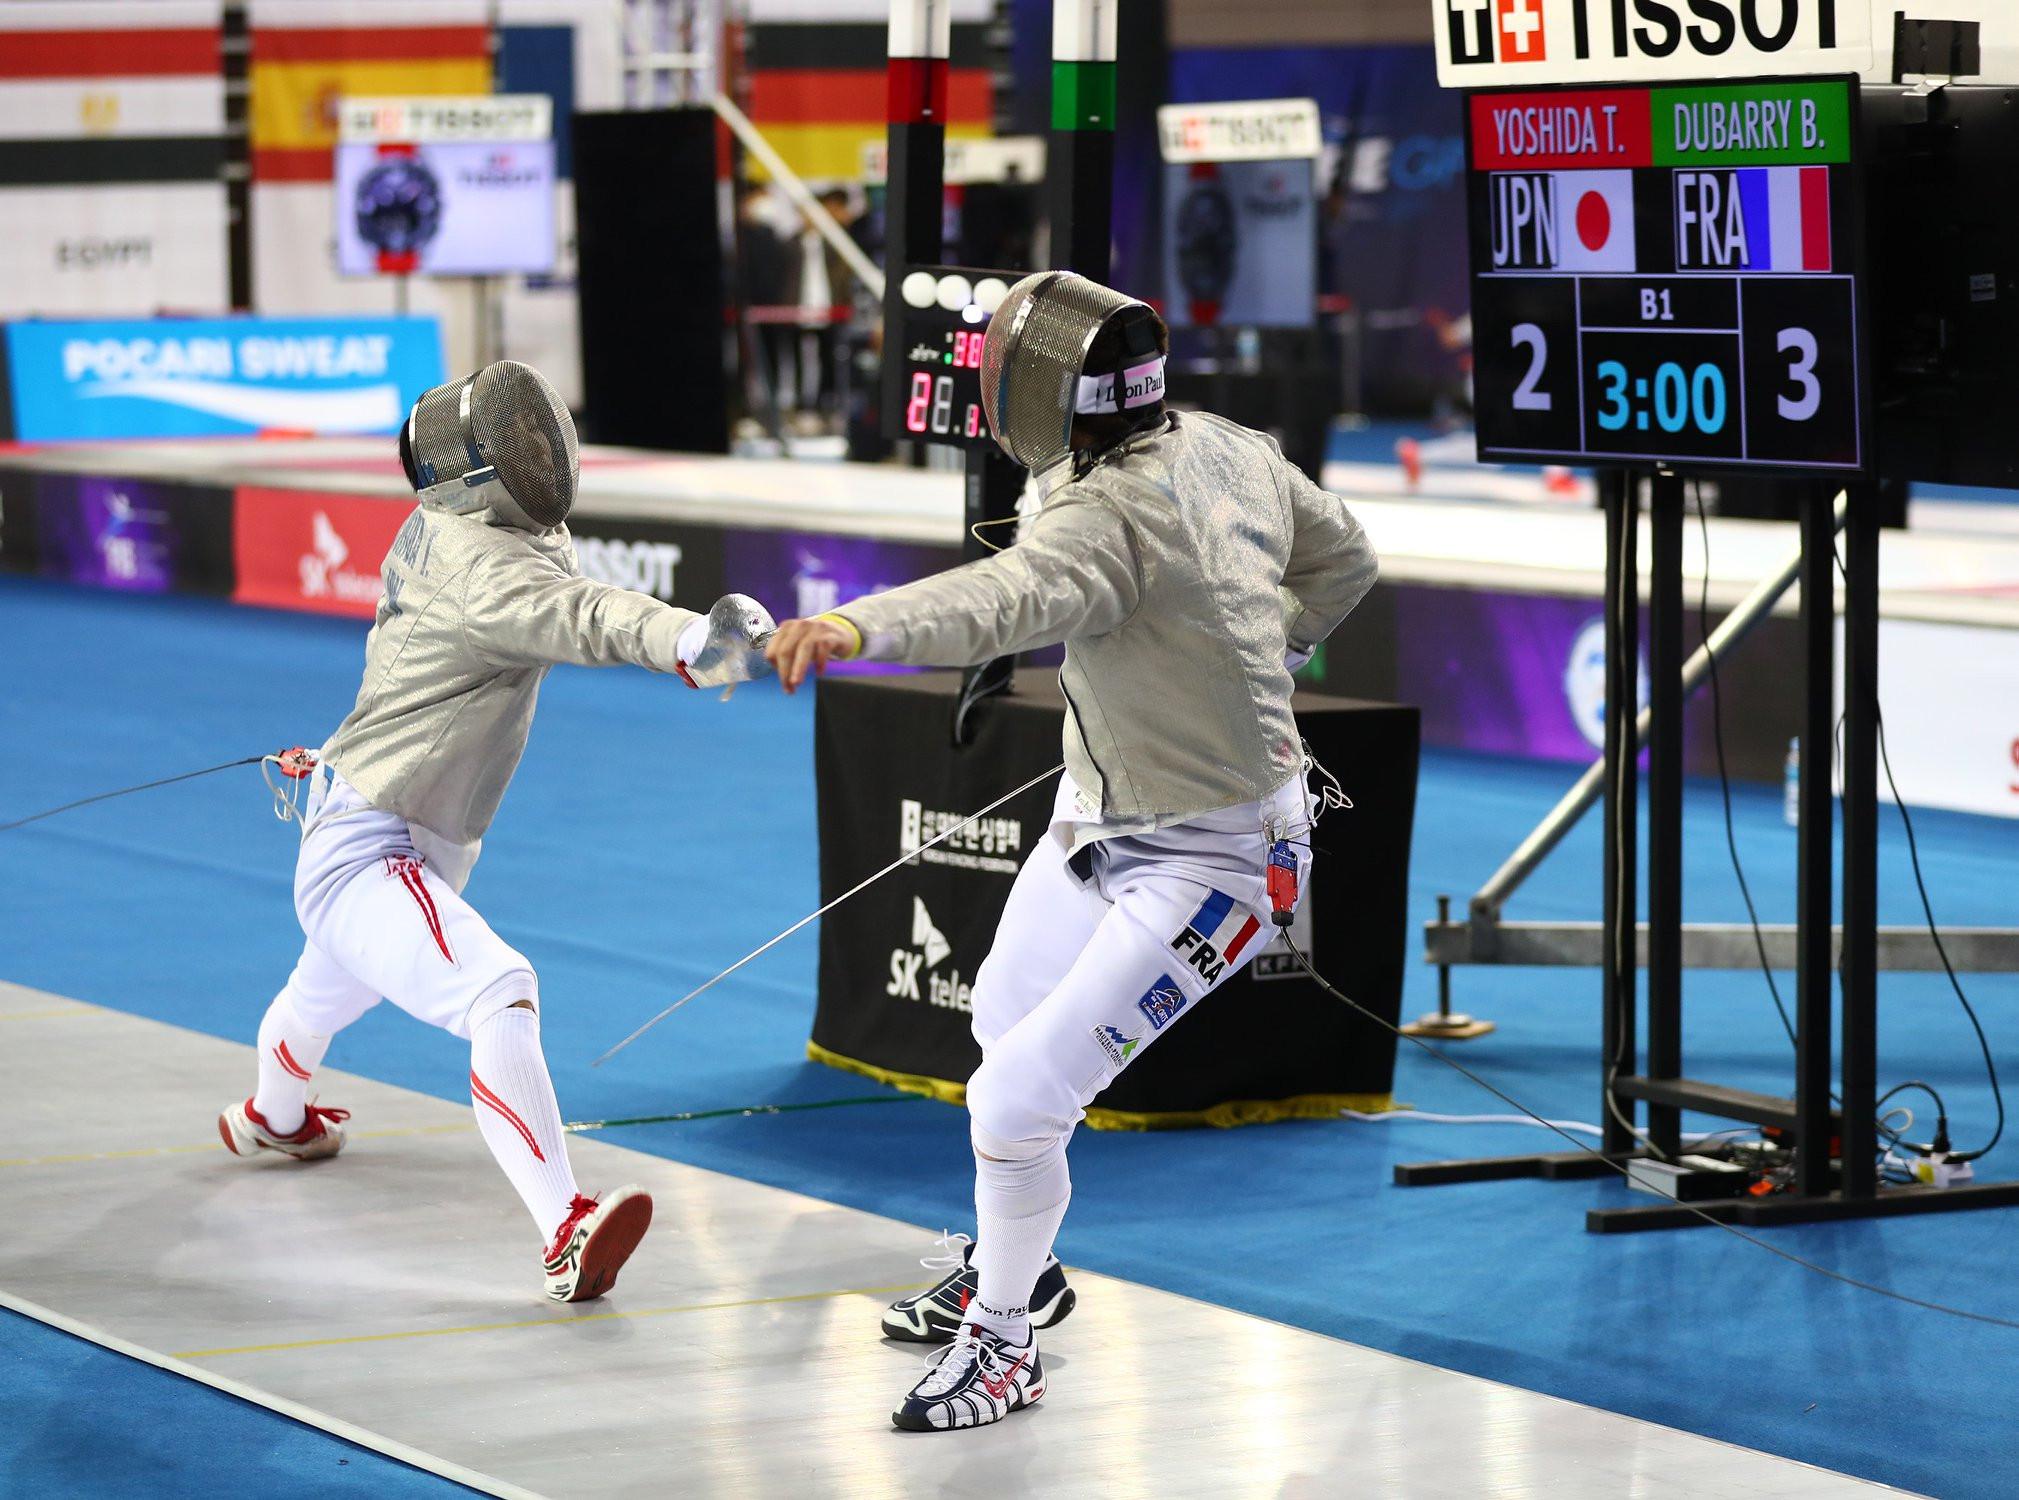 Hungary's Decsi tops men's qualification at FIE Sabre Grand Prix in Seoul